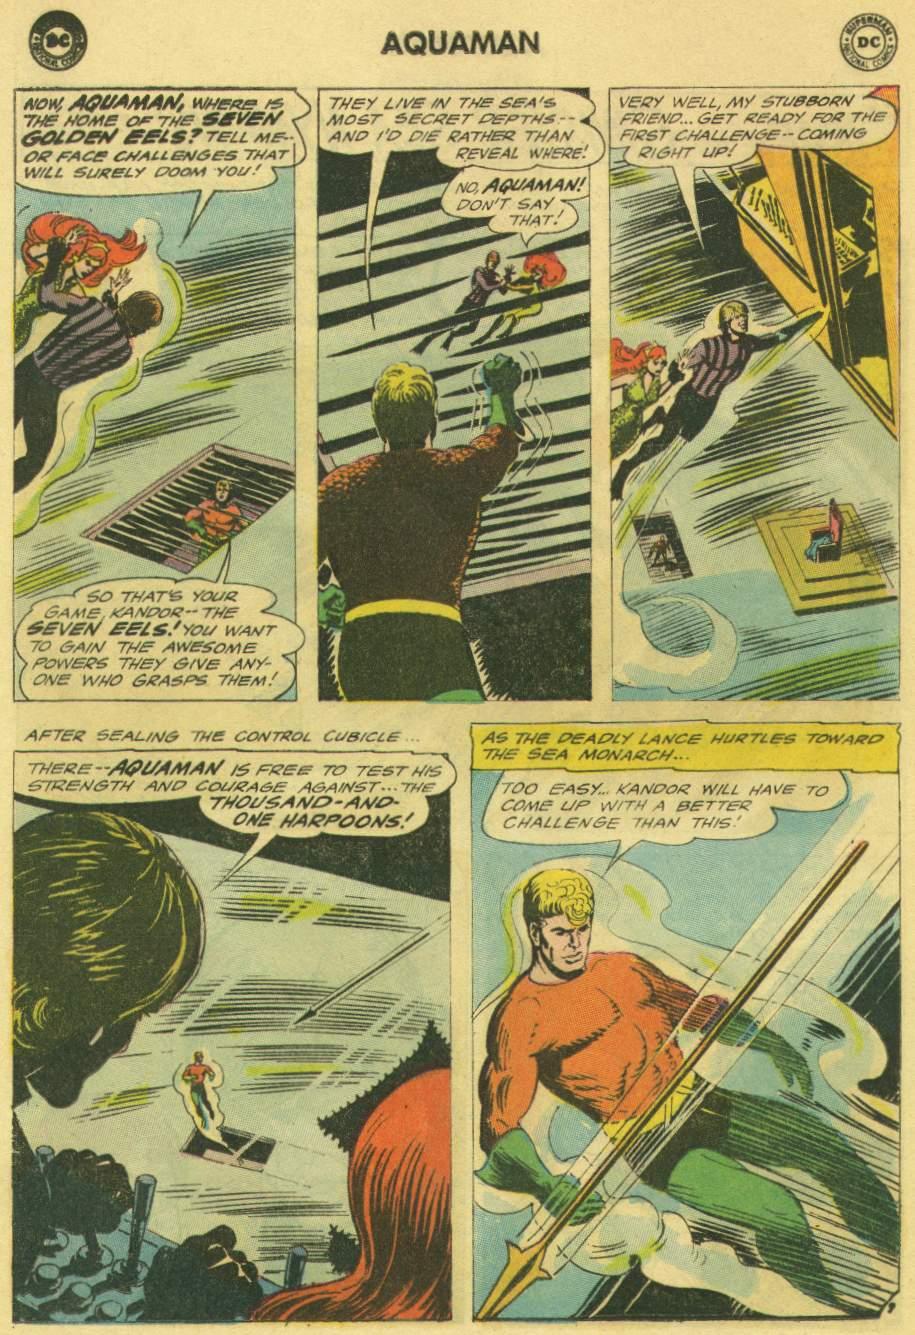 Read online Aquaman (1962) comic -  Issue #22 - 12